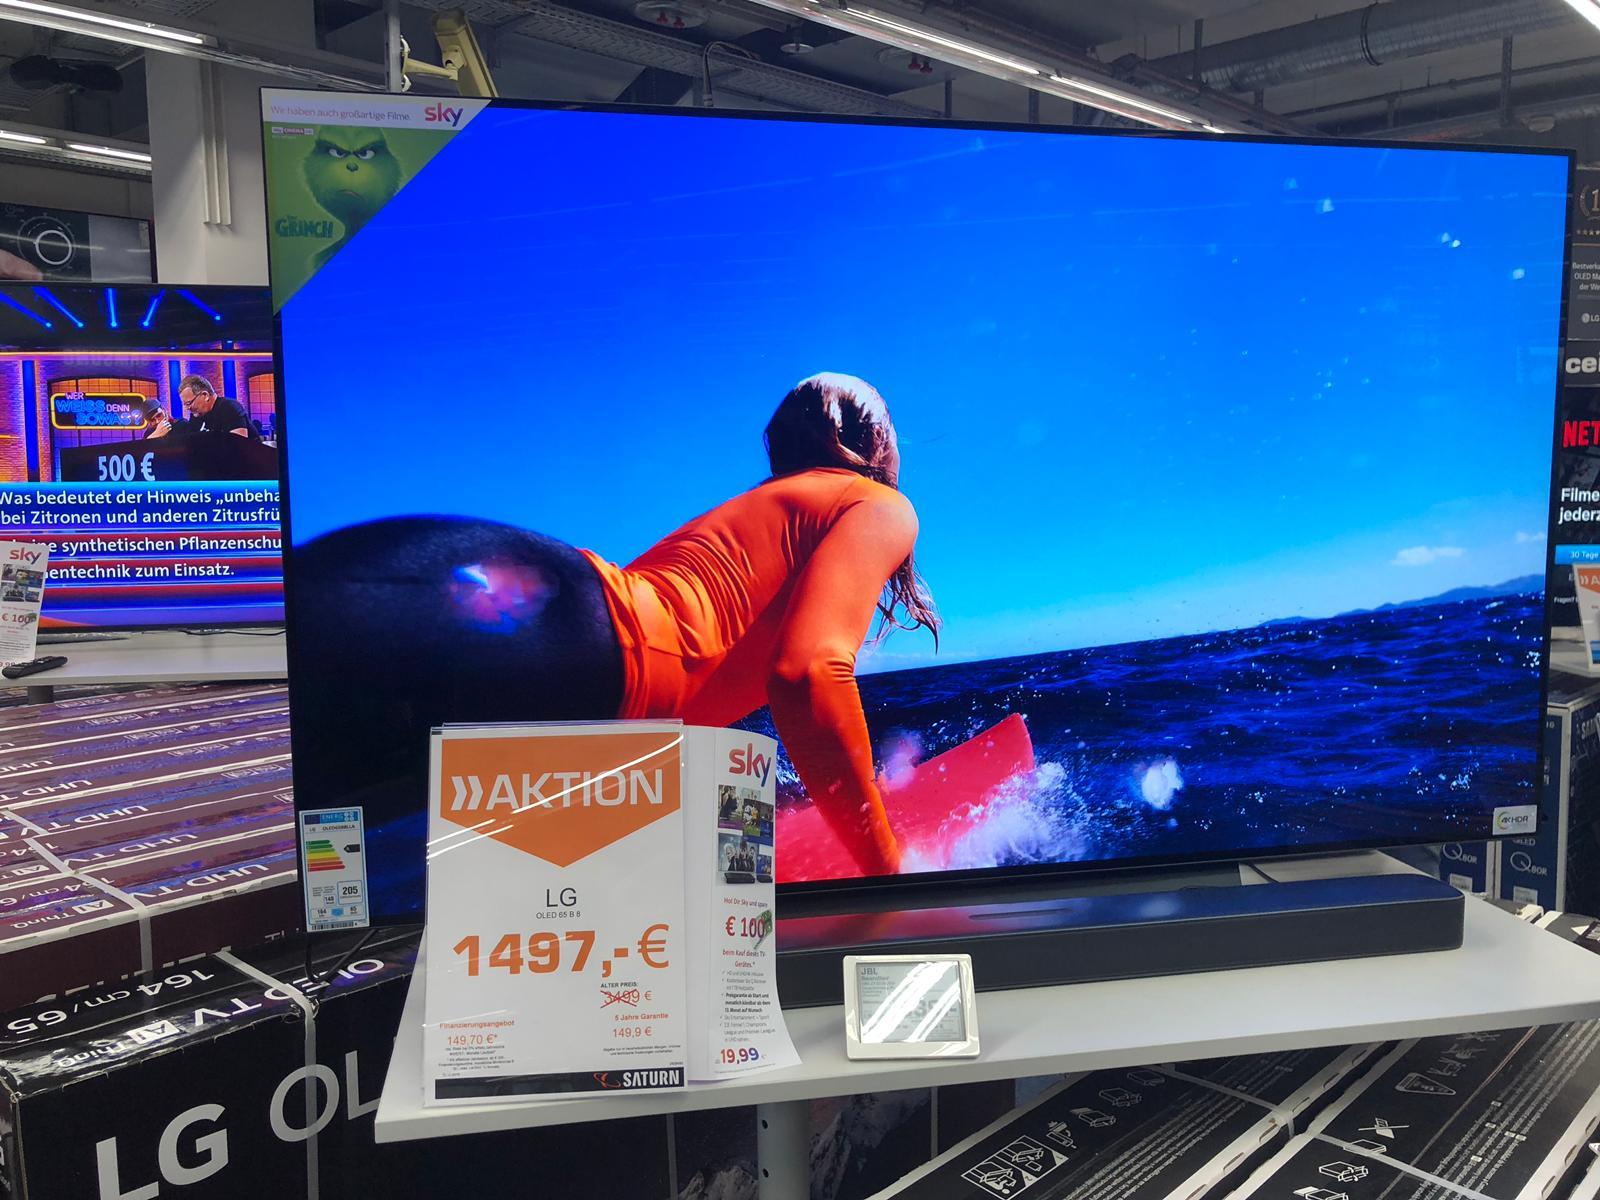 (LOKAL) Saturn Bad Homburg - 65 B8 LLA (OLED, 120hz, Twin Tuner, Smart TV, Dolby Vision & Atmos)